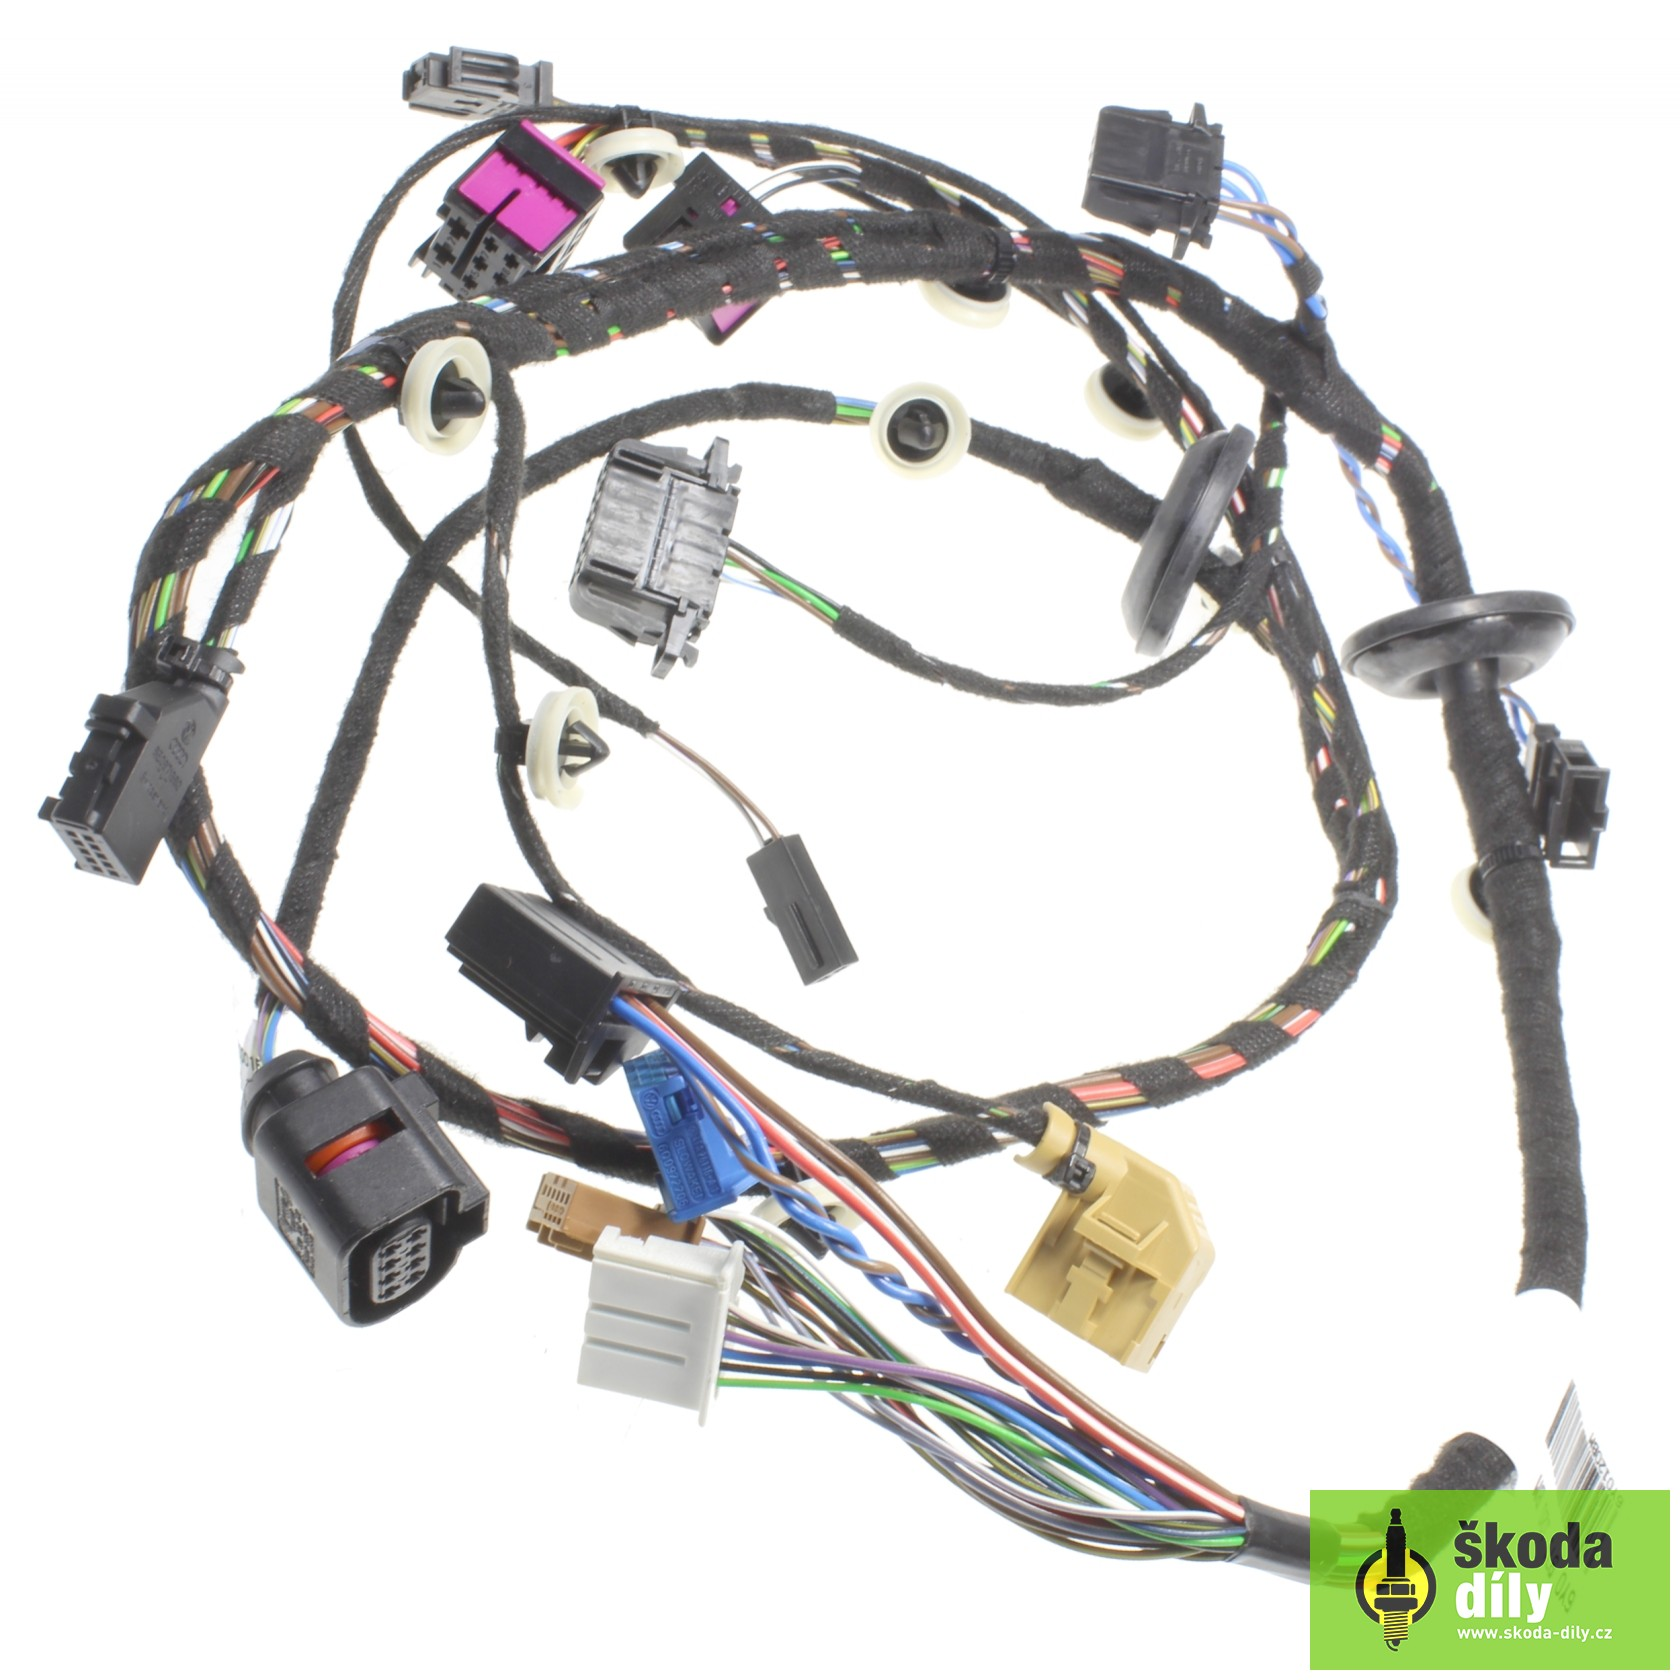 Marvelous Front Door Electrical Wiring Installation Bundle Skoda 6Y0971120Bm Wiring 101 Breceaxxcnl